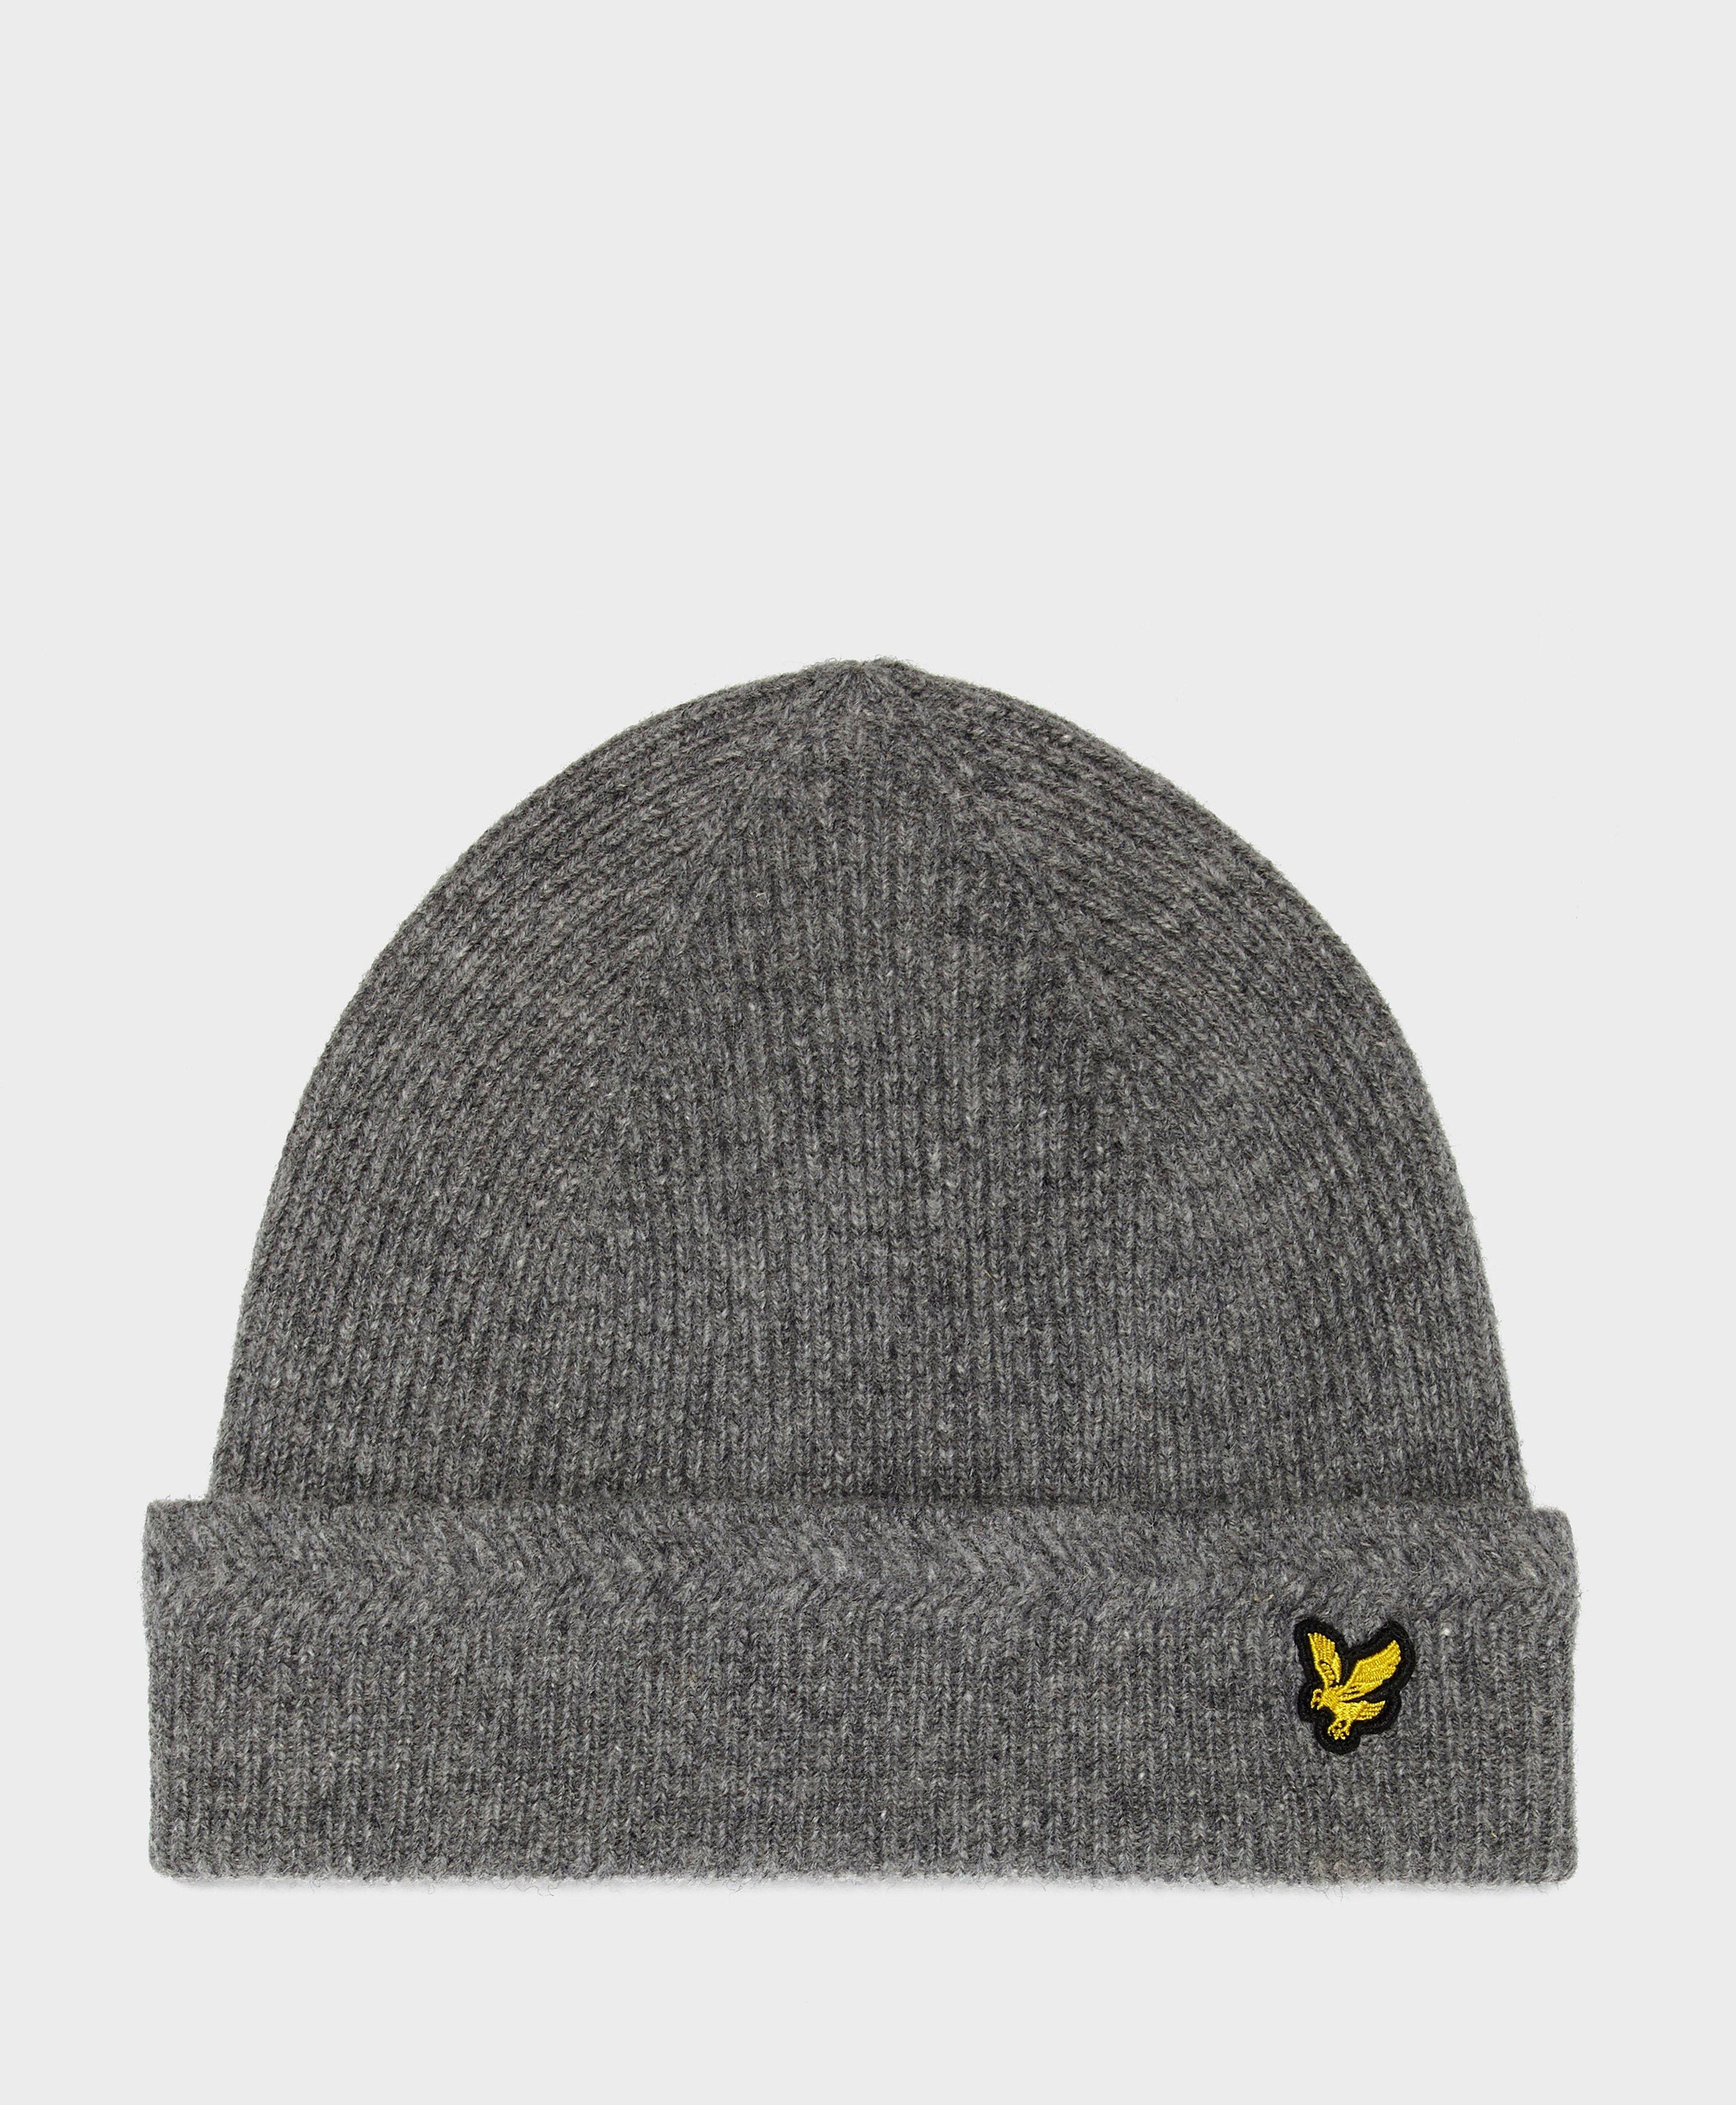 Lyle & Scott Rib Knitted Hat